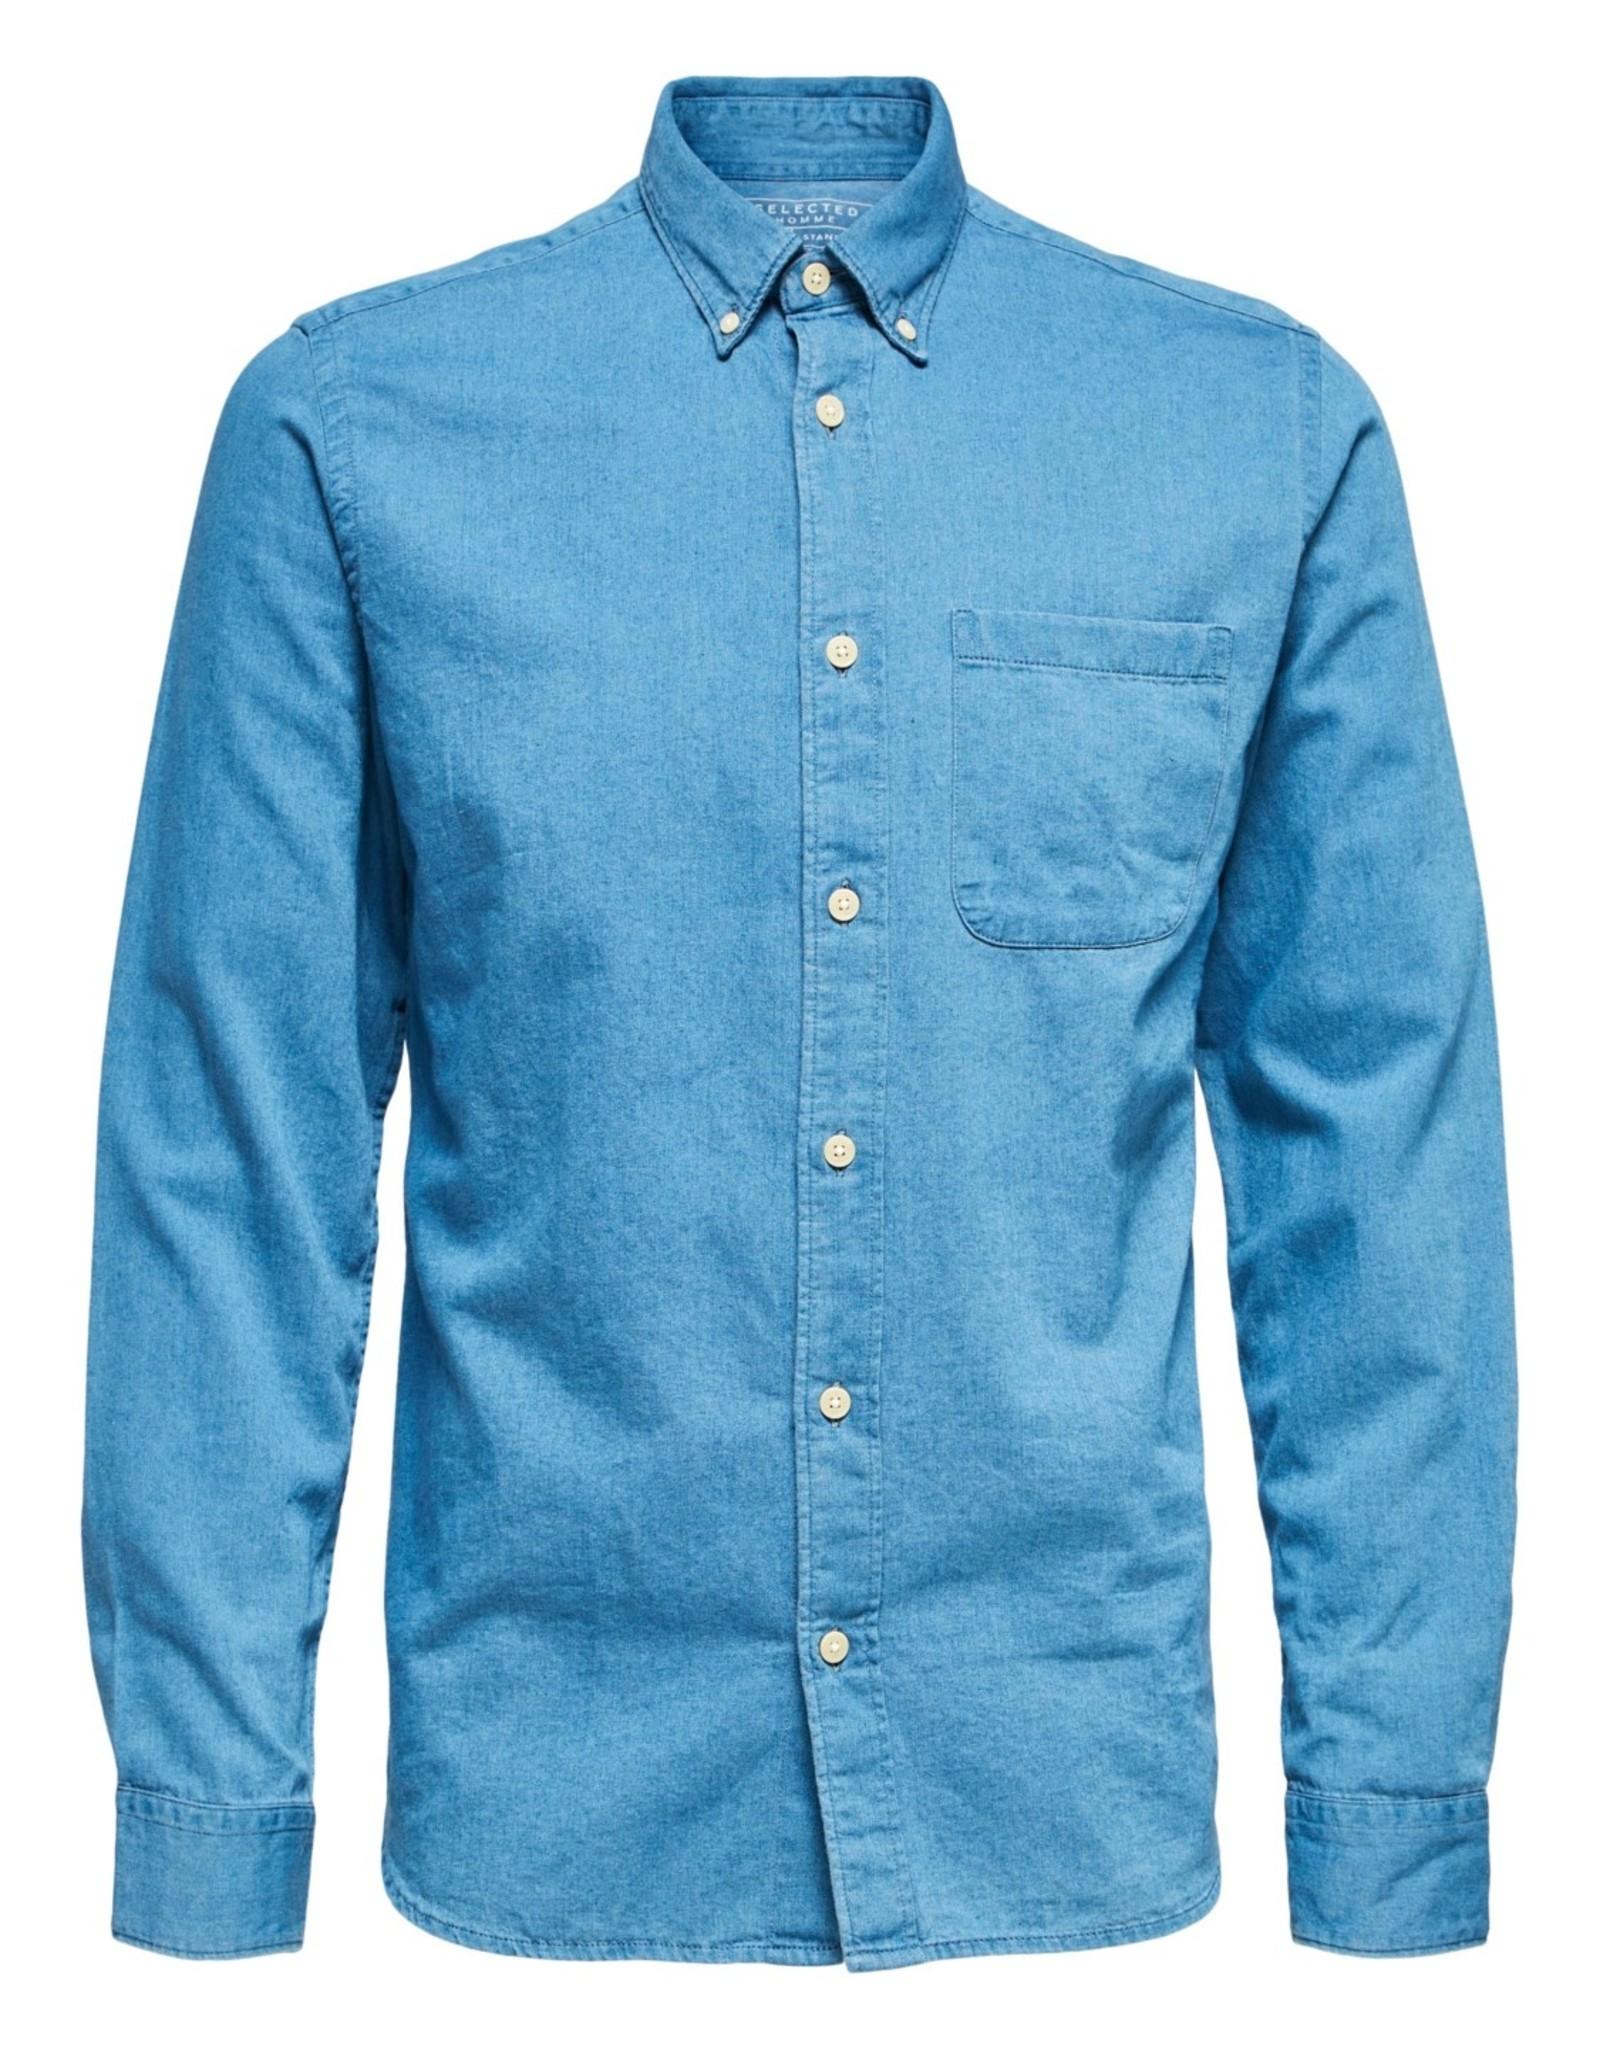 Selected Homme SS21-1-SE-Regrick Denim Shirt 77358